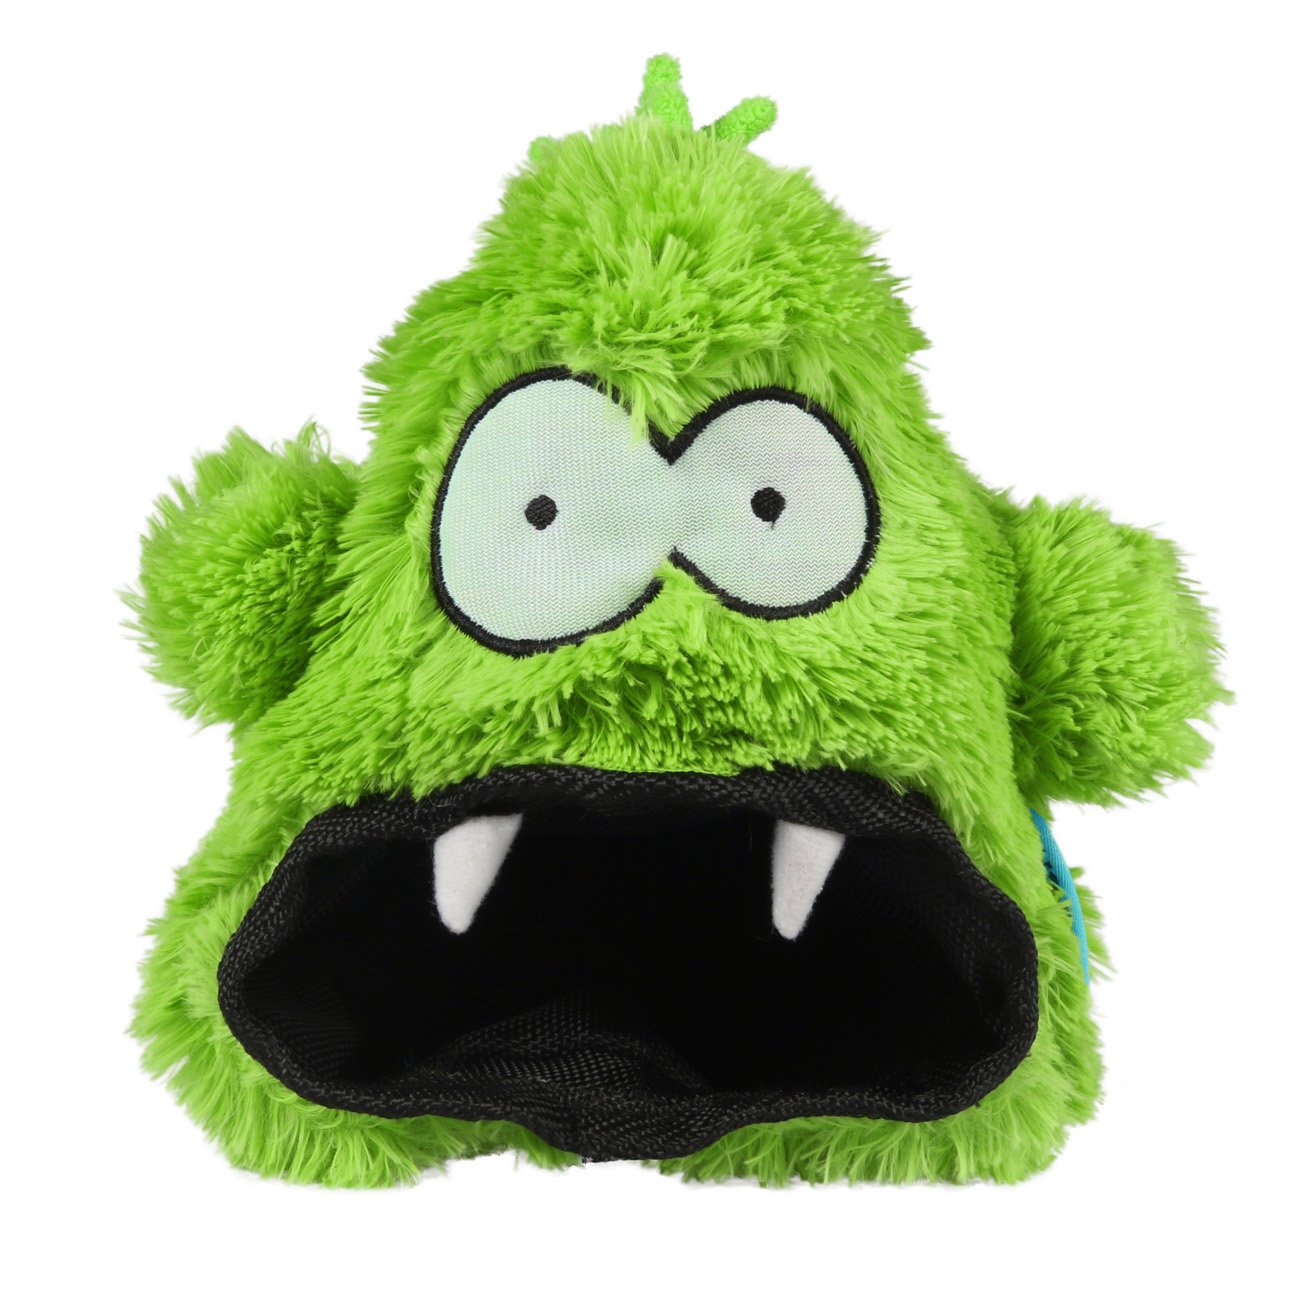 Coockoo Plüsch Monster Hundespielzeug, Bild 8